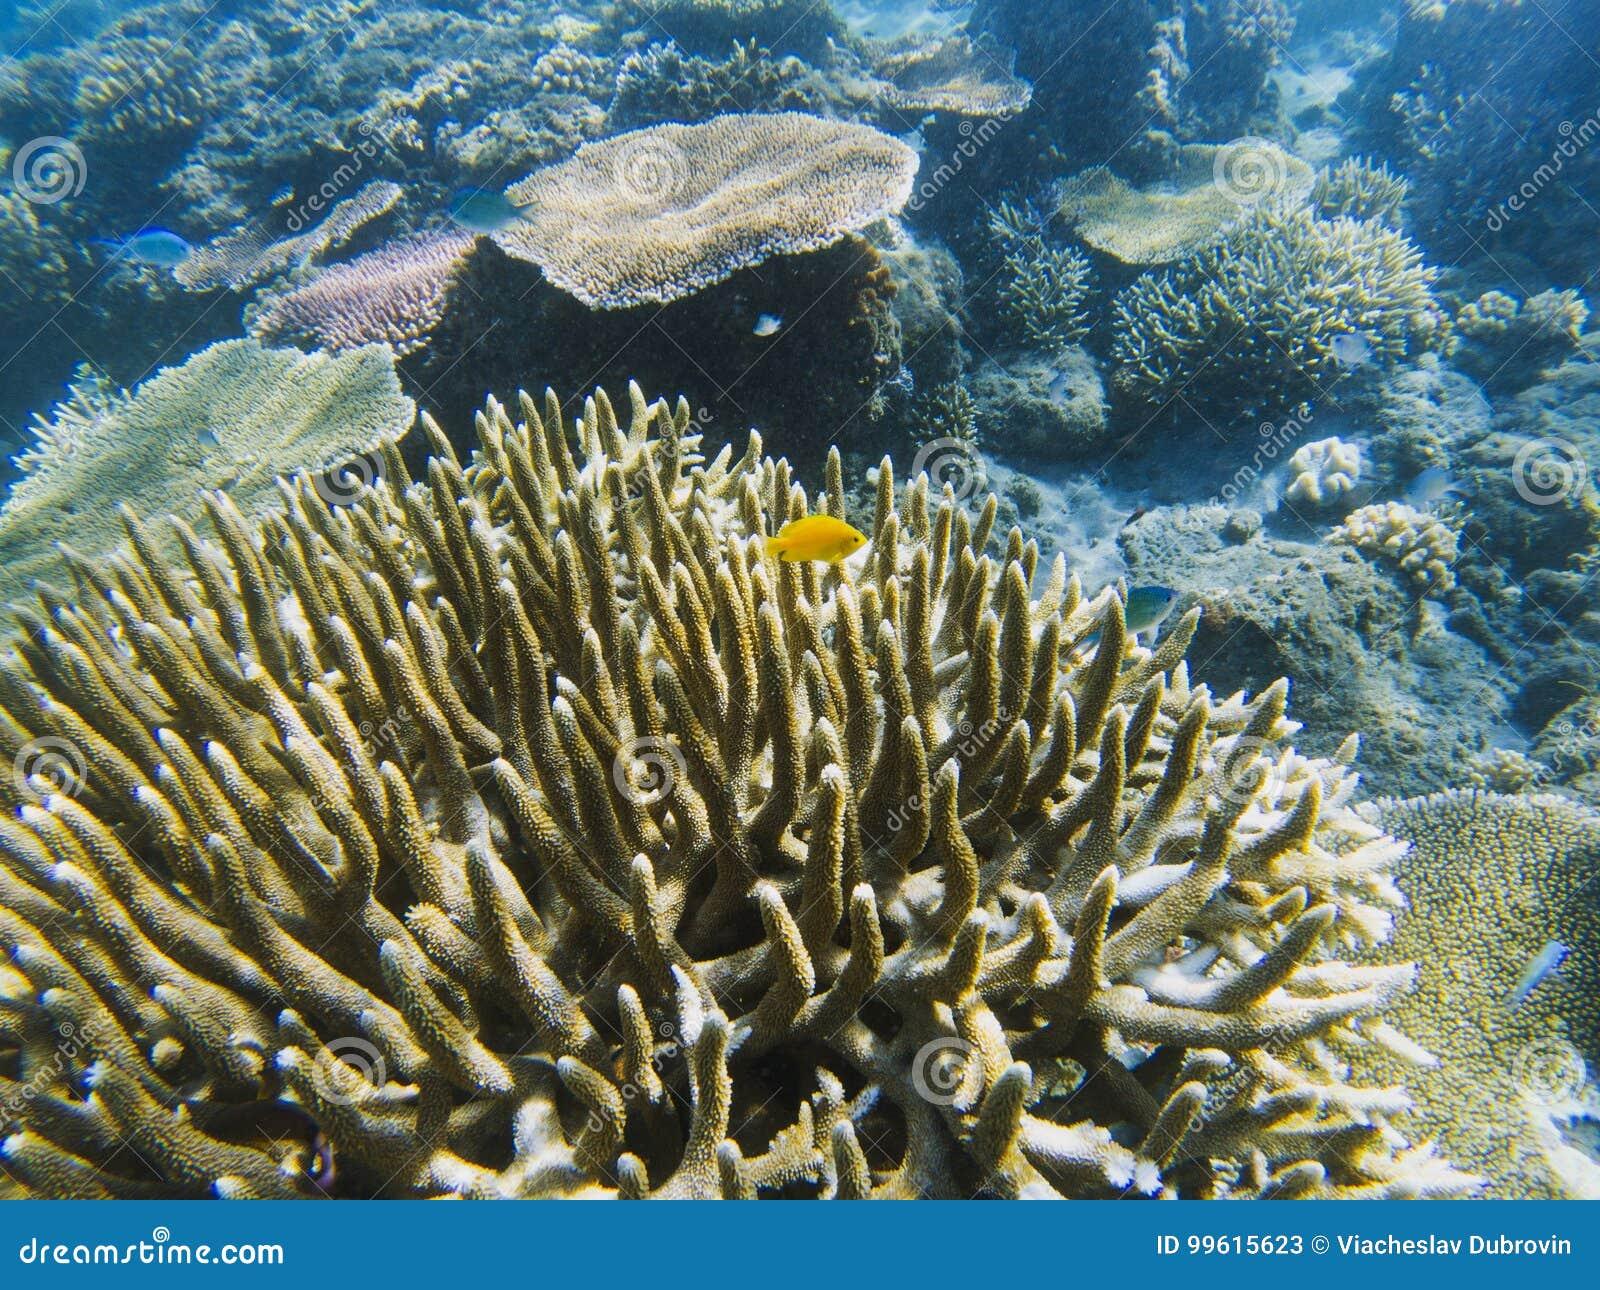 Yellow fish in spiky coral reef. Tropical seashore inhabitants underwater photo.